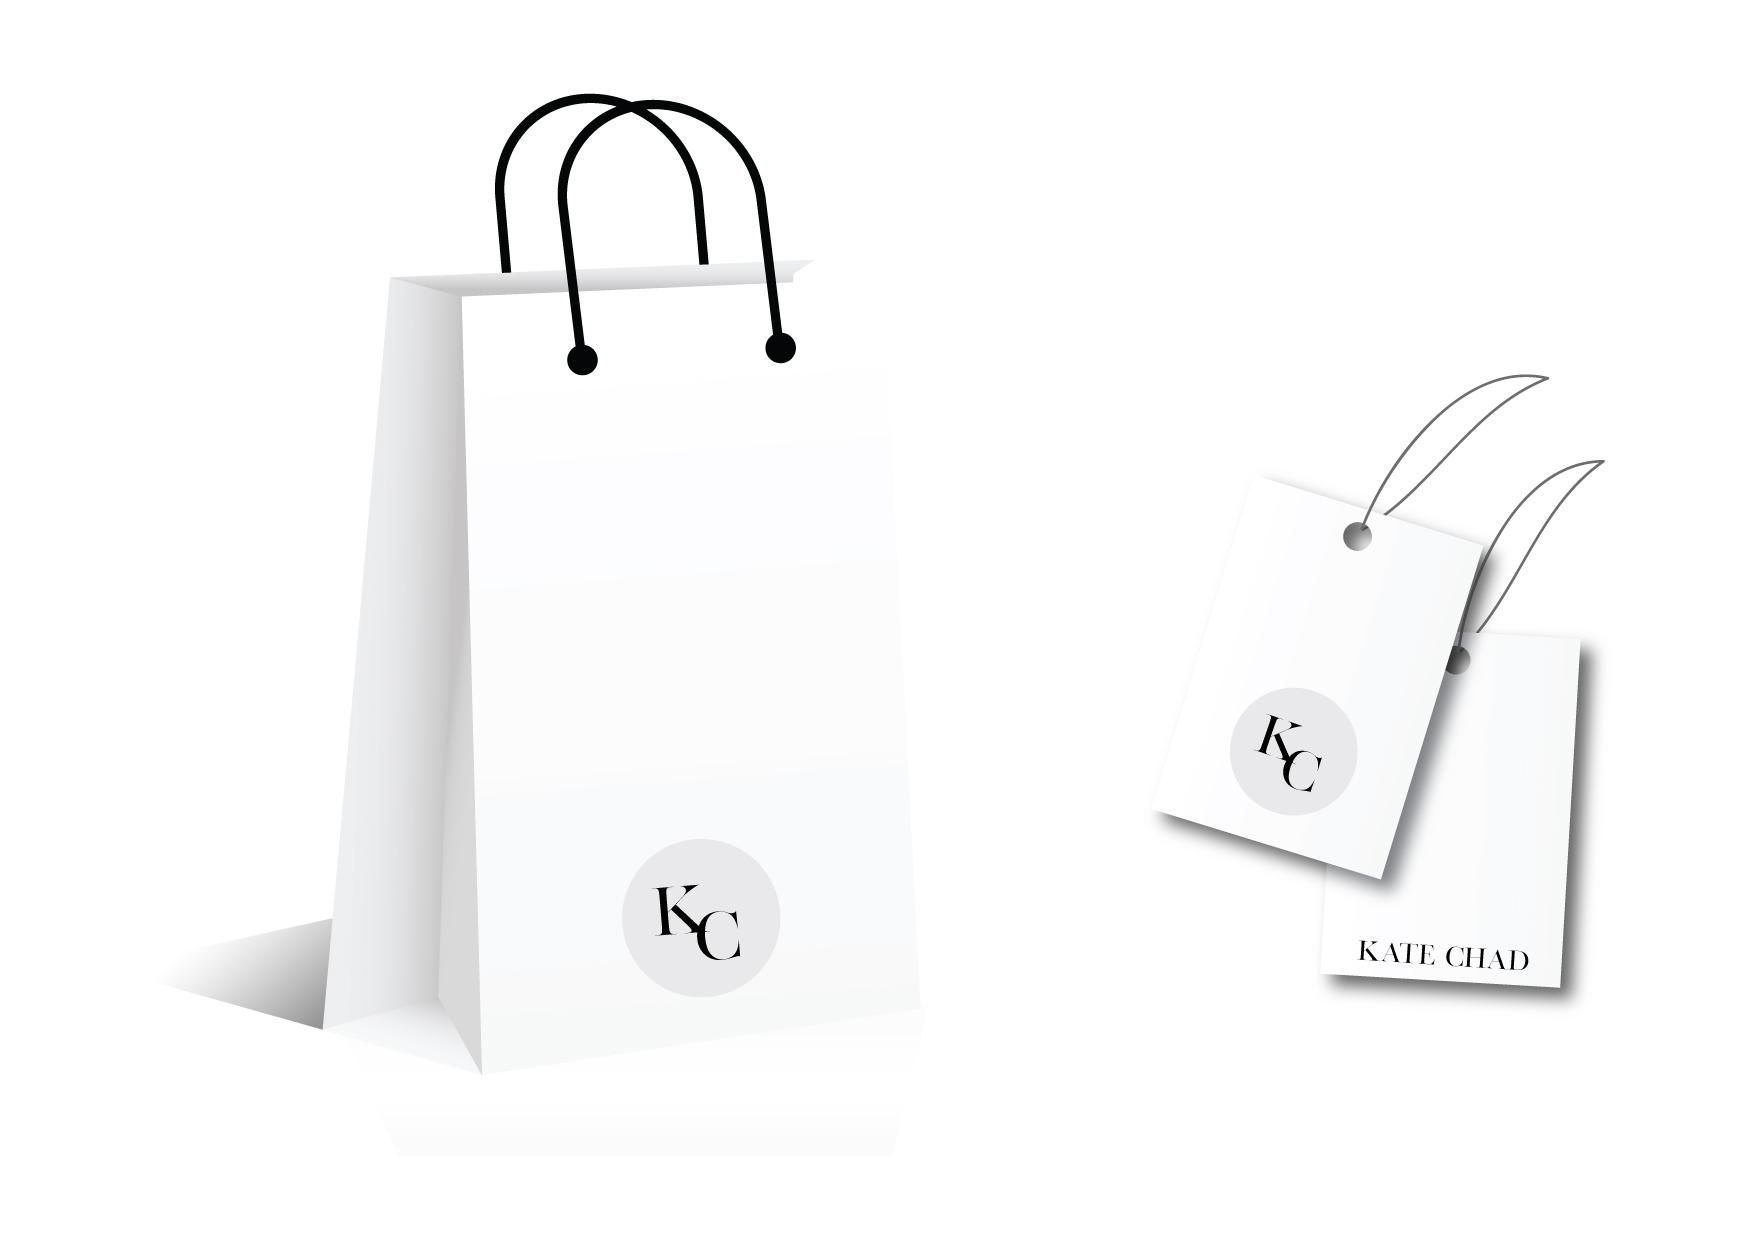 Kate Chad Logo Concept 2_11.jpg